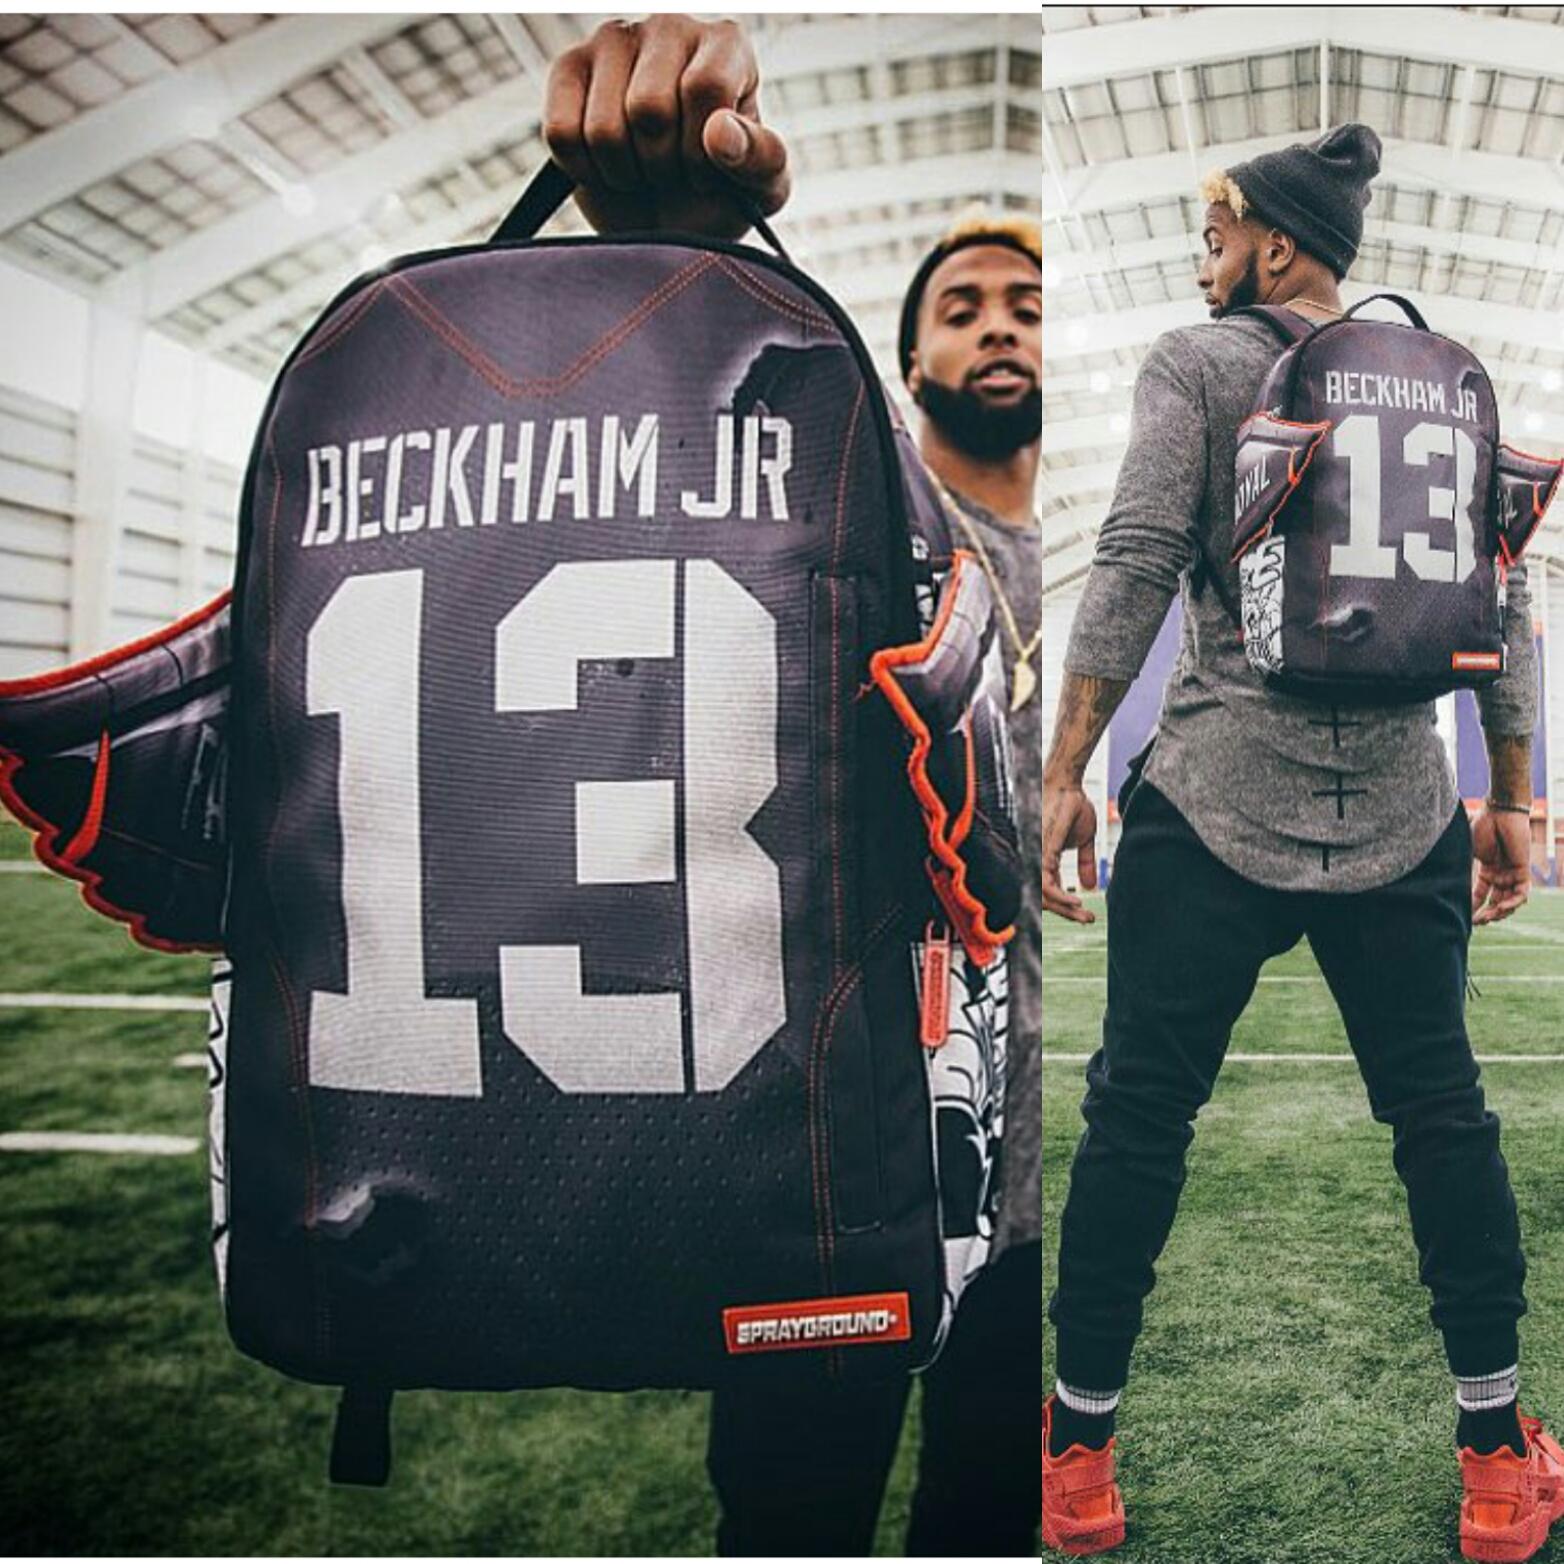 NFL Odell Beckham Jr. Teams With SprayGround, Designs Limited Edition Backpack